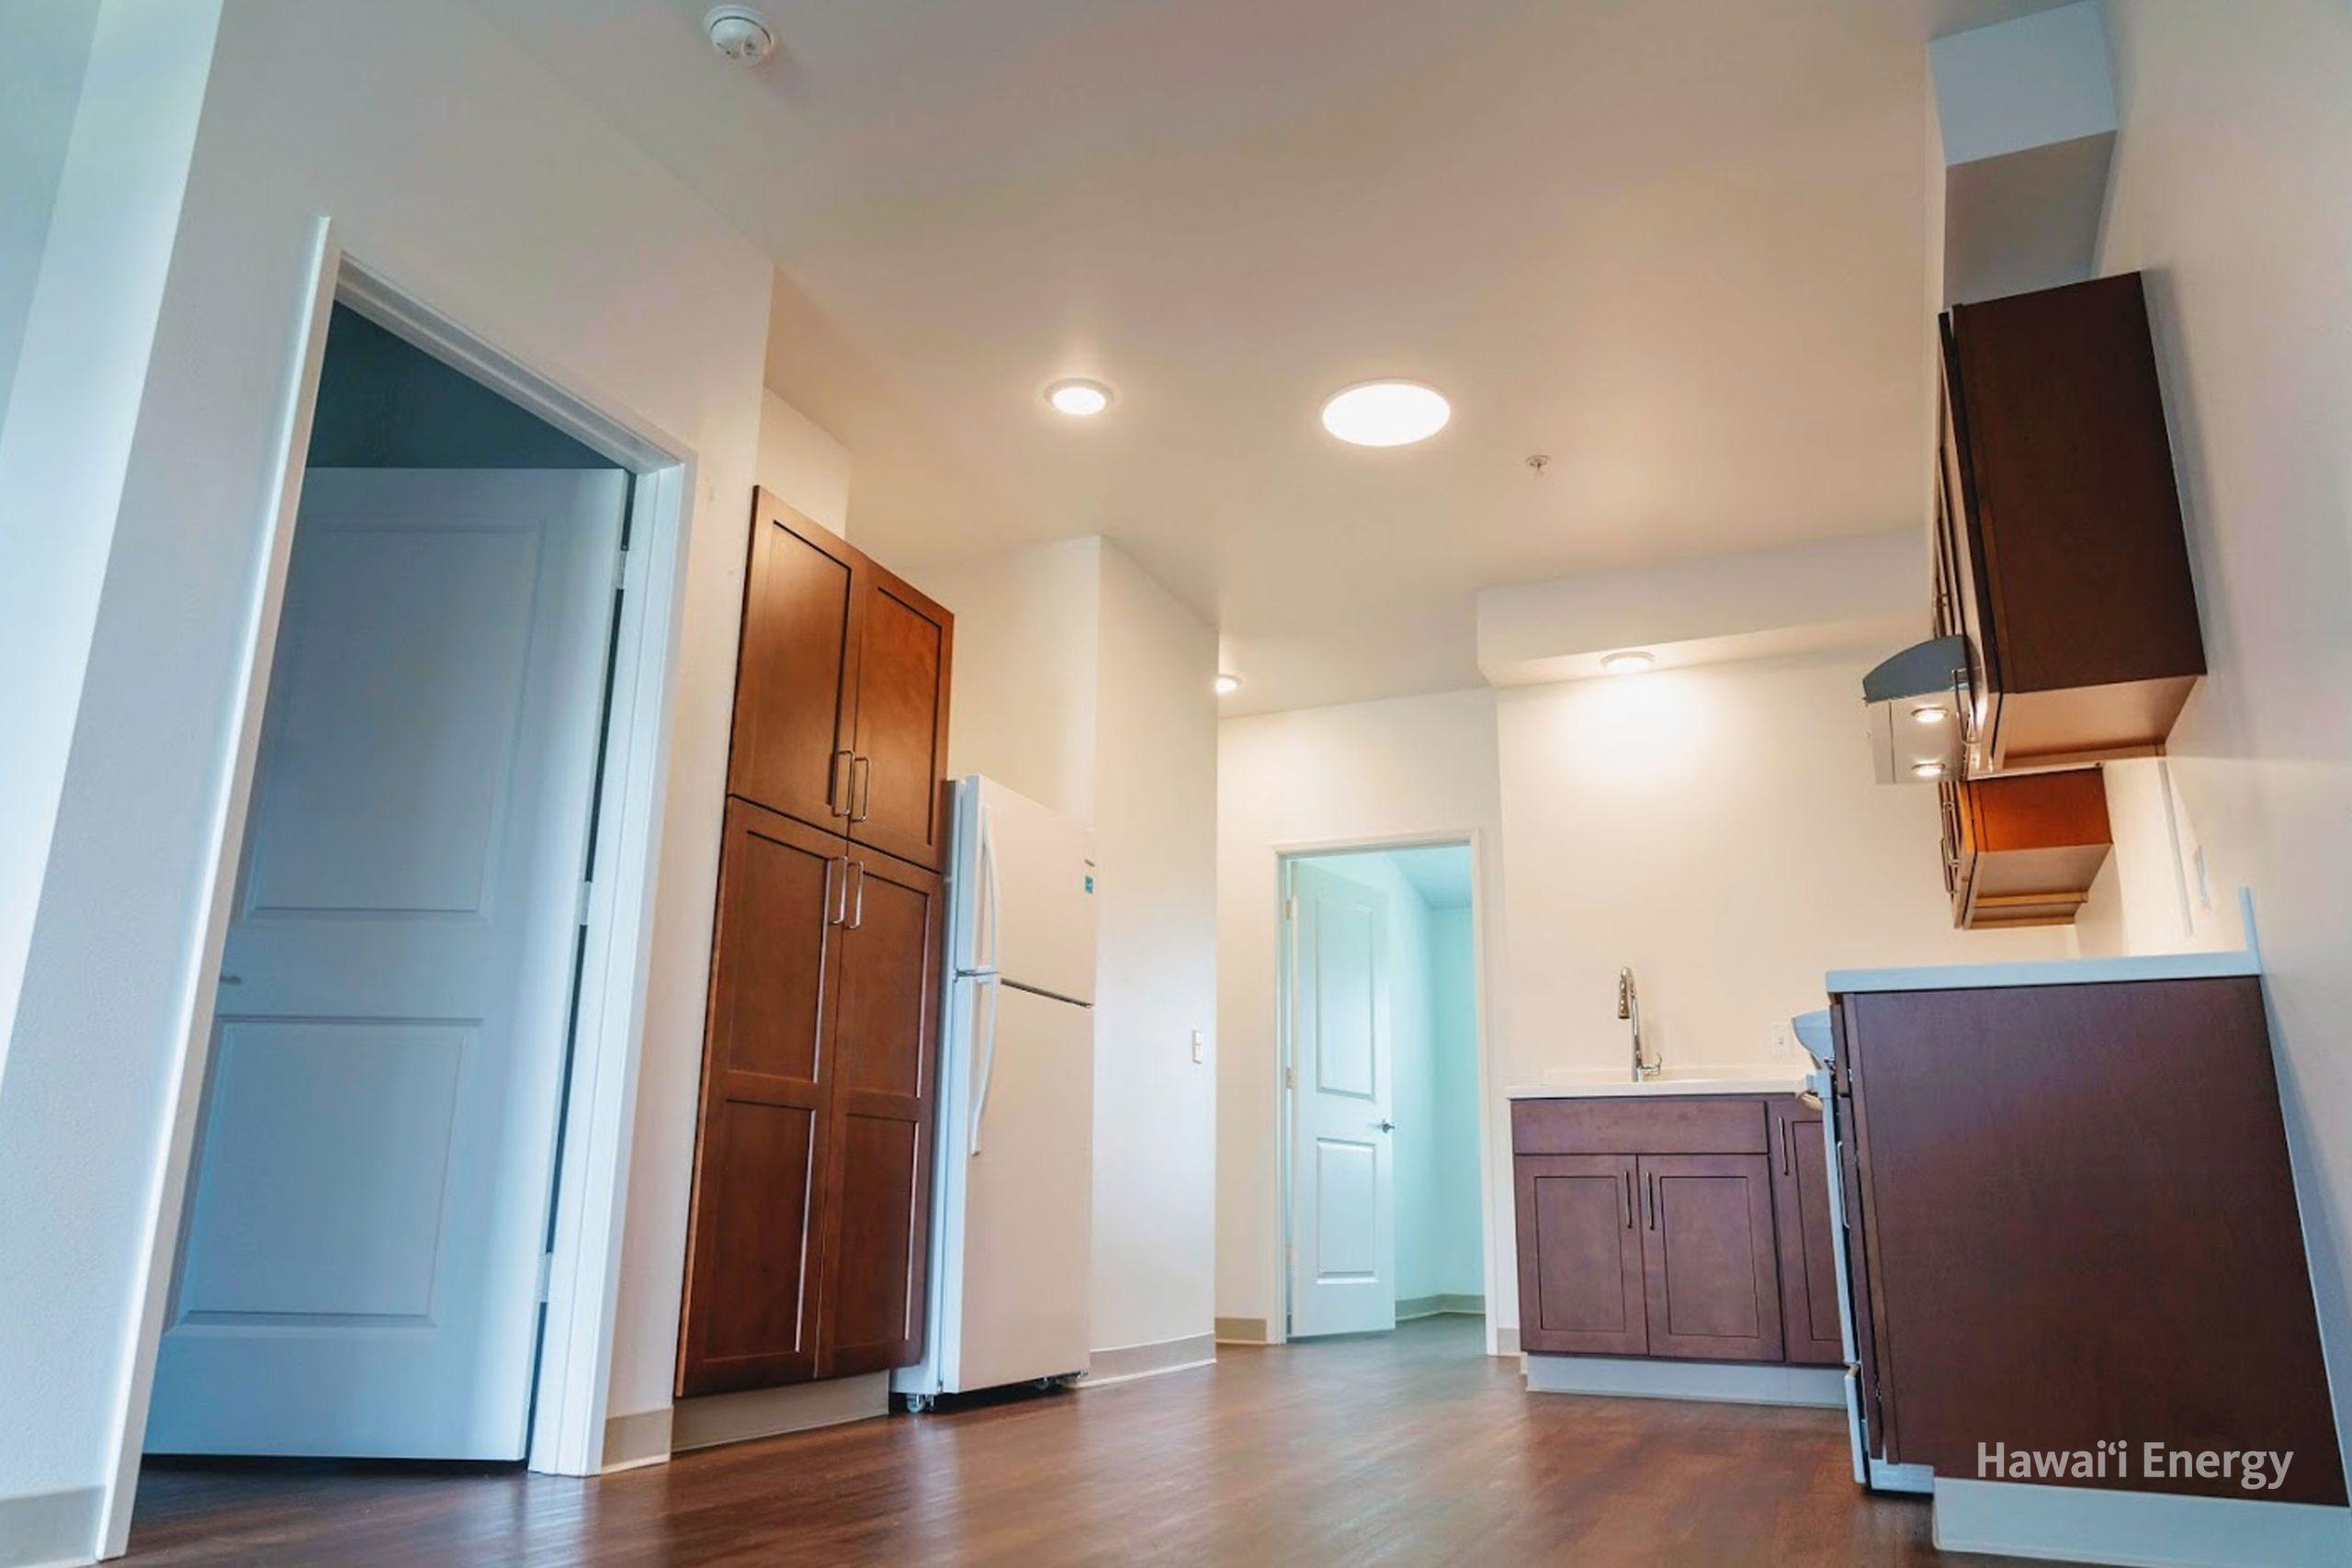 $5000 Energy Efficiency Grant Application Deadline is Sept. 30